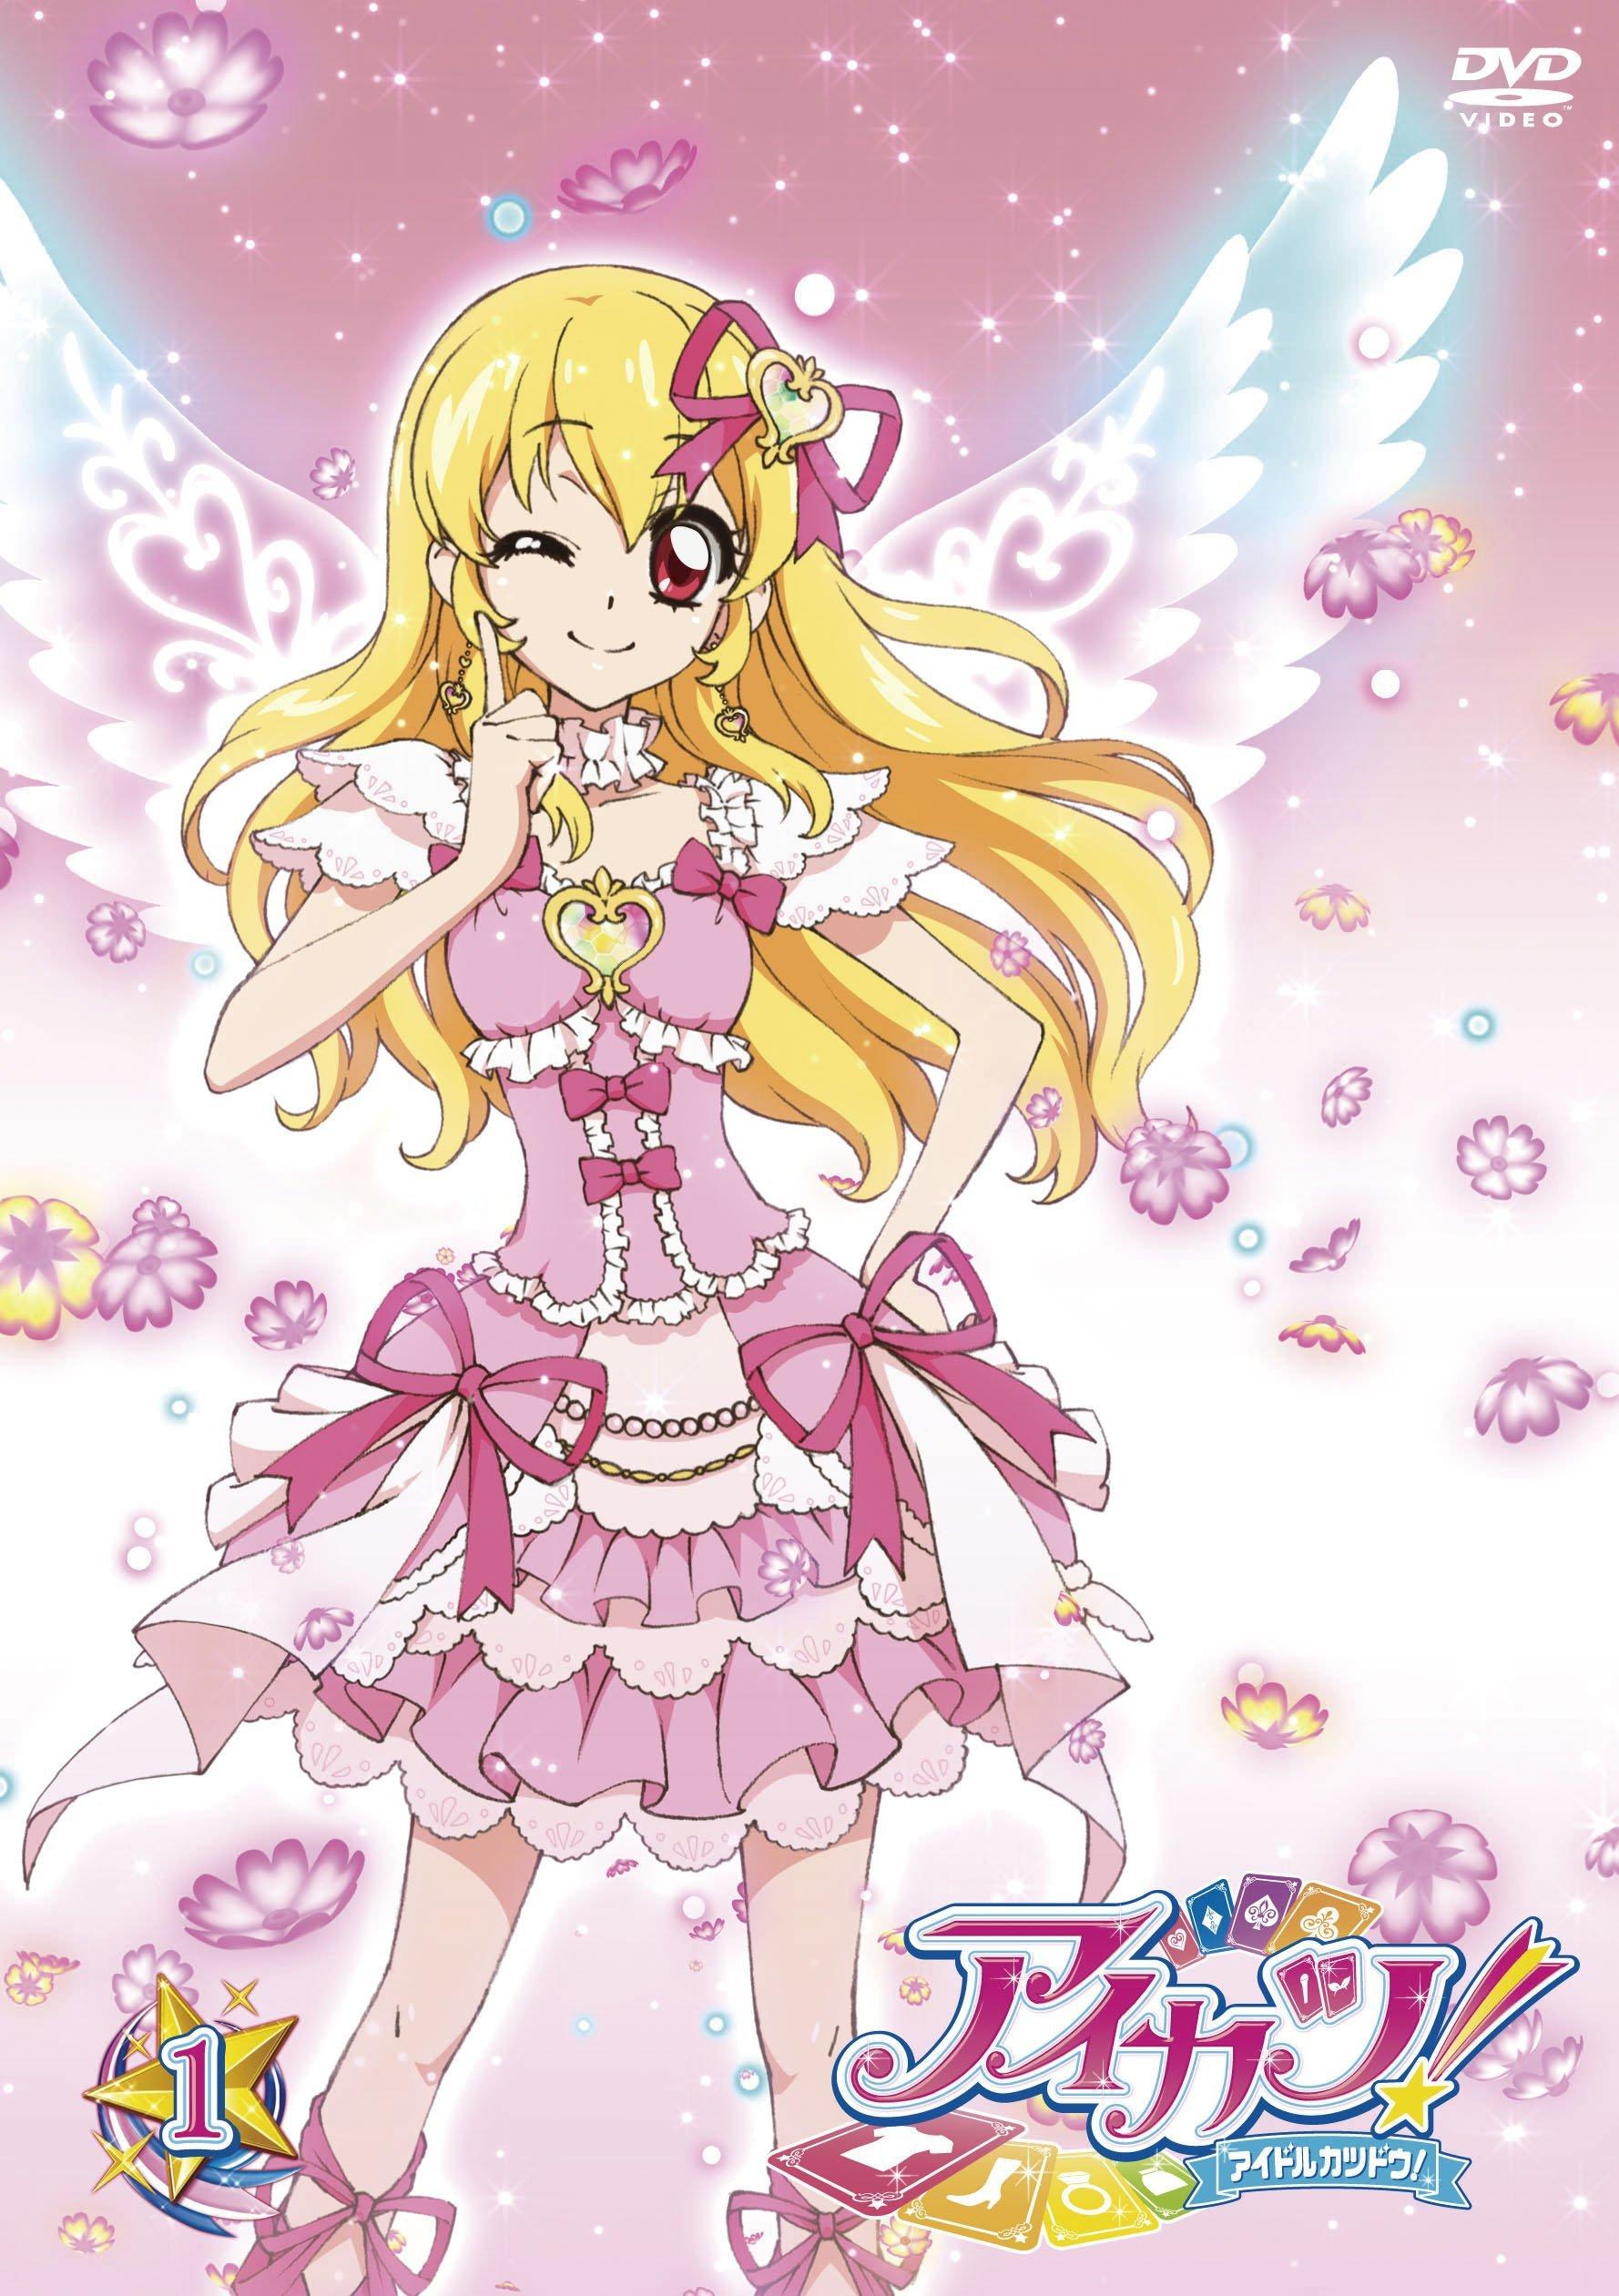 Aikatsu franchise dvd and bd releases aikatsu wiki fandom powered by wikia - Diva mizuki 2 ...